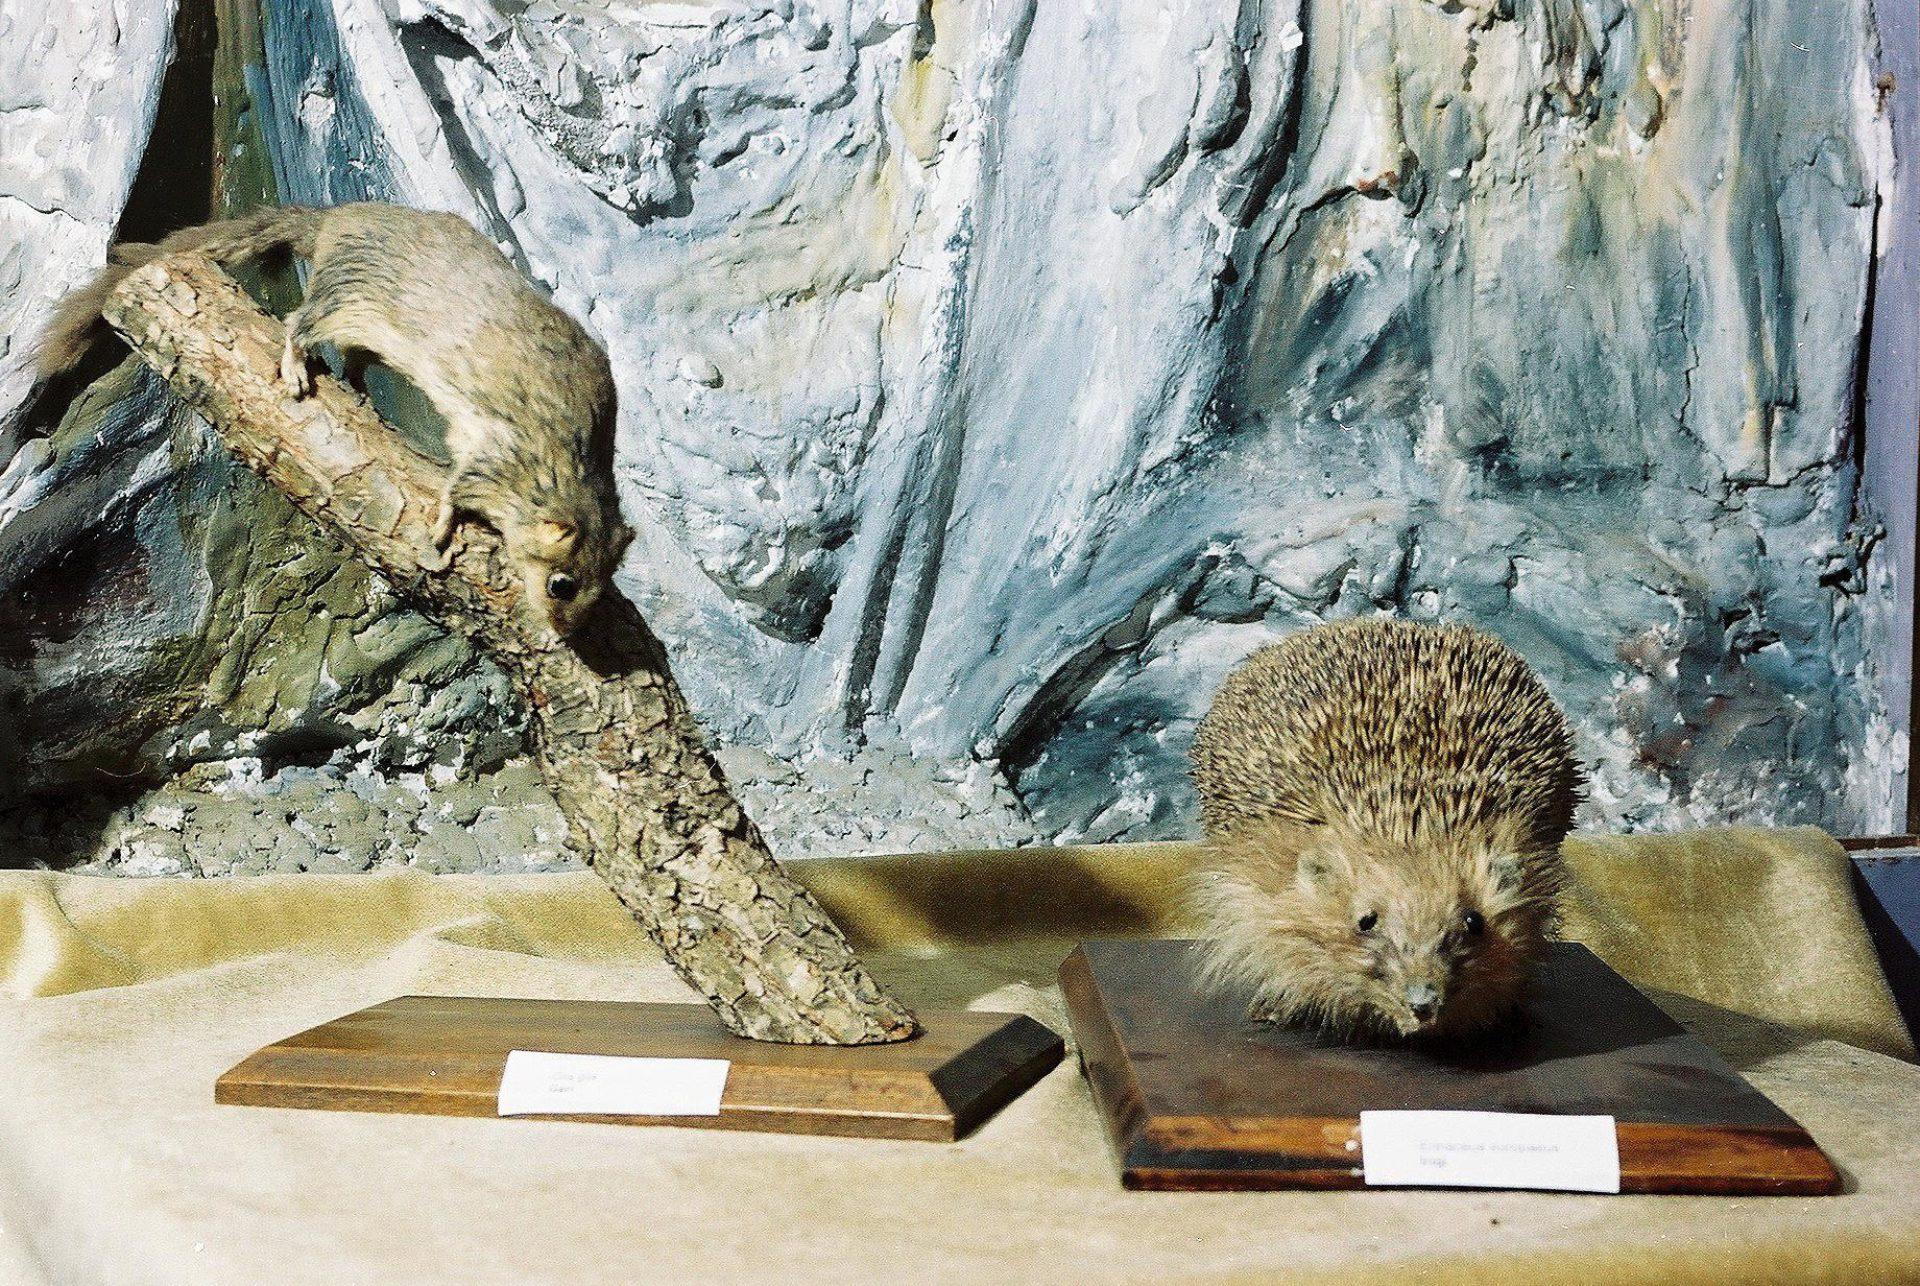 Petrit Halilaj, Special Edition (ex-Natural History Museum of Kosovo), 2013 (41/80)